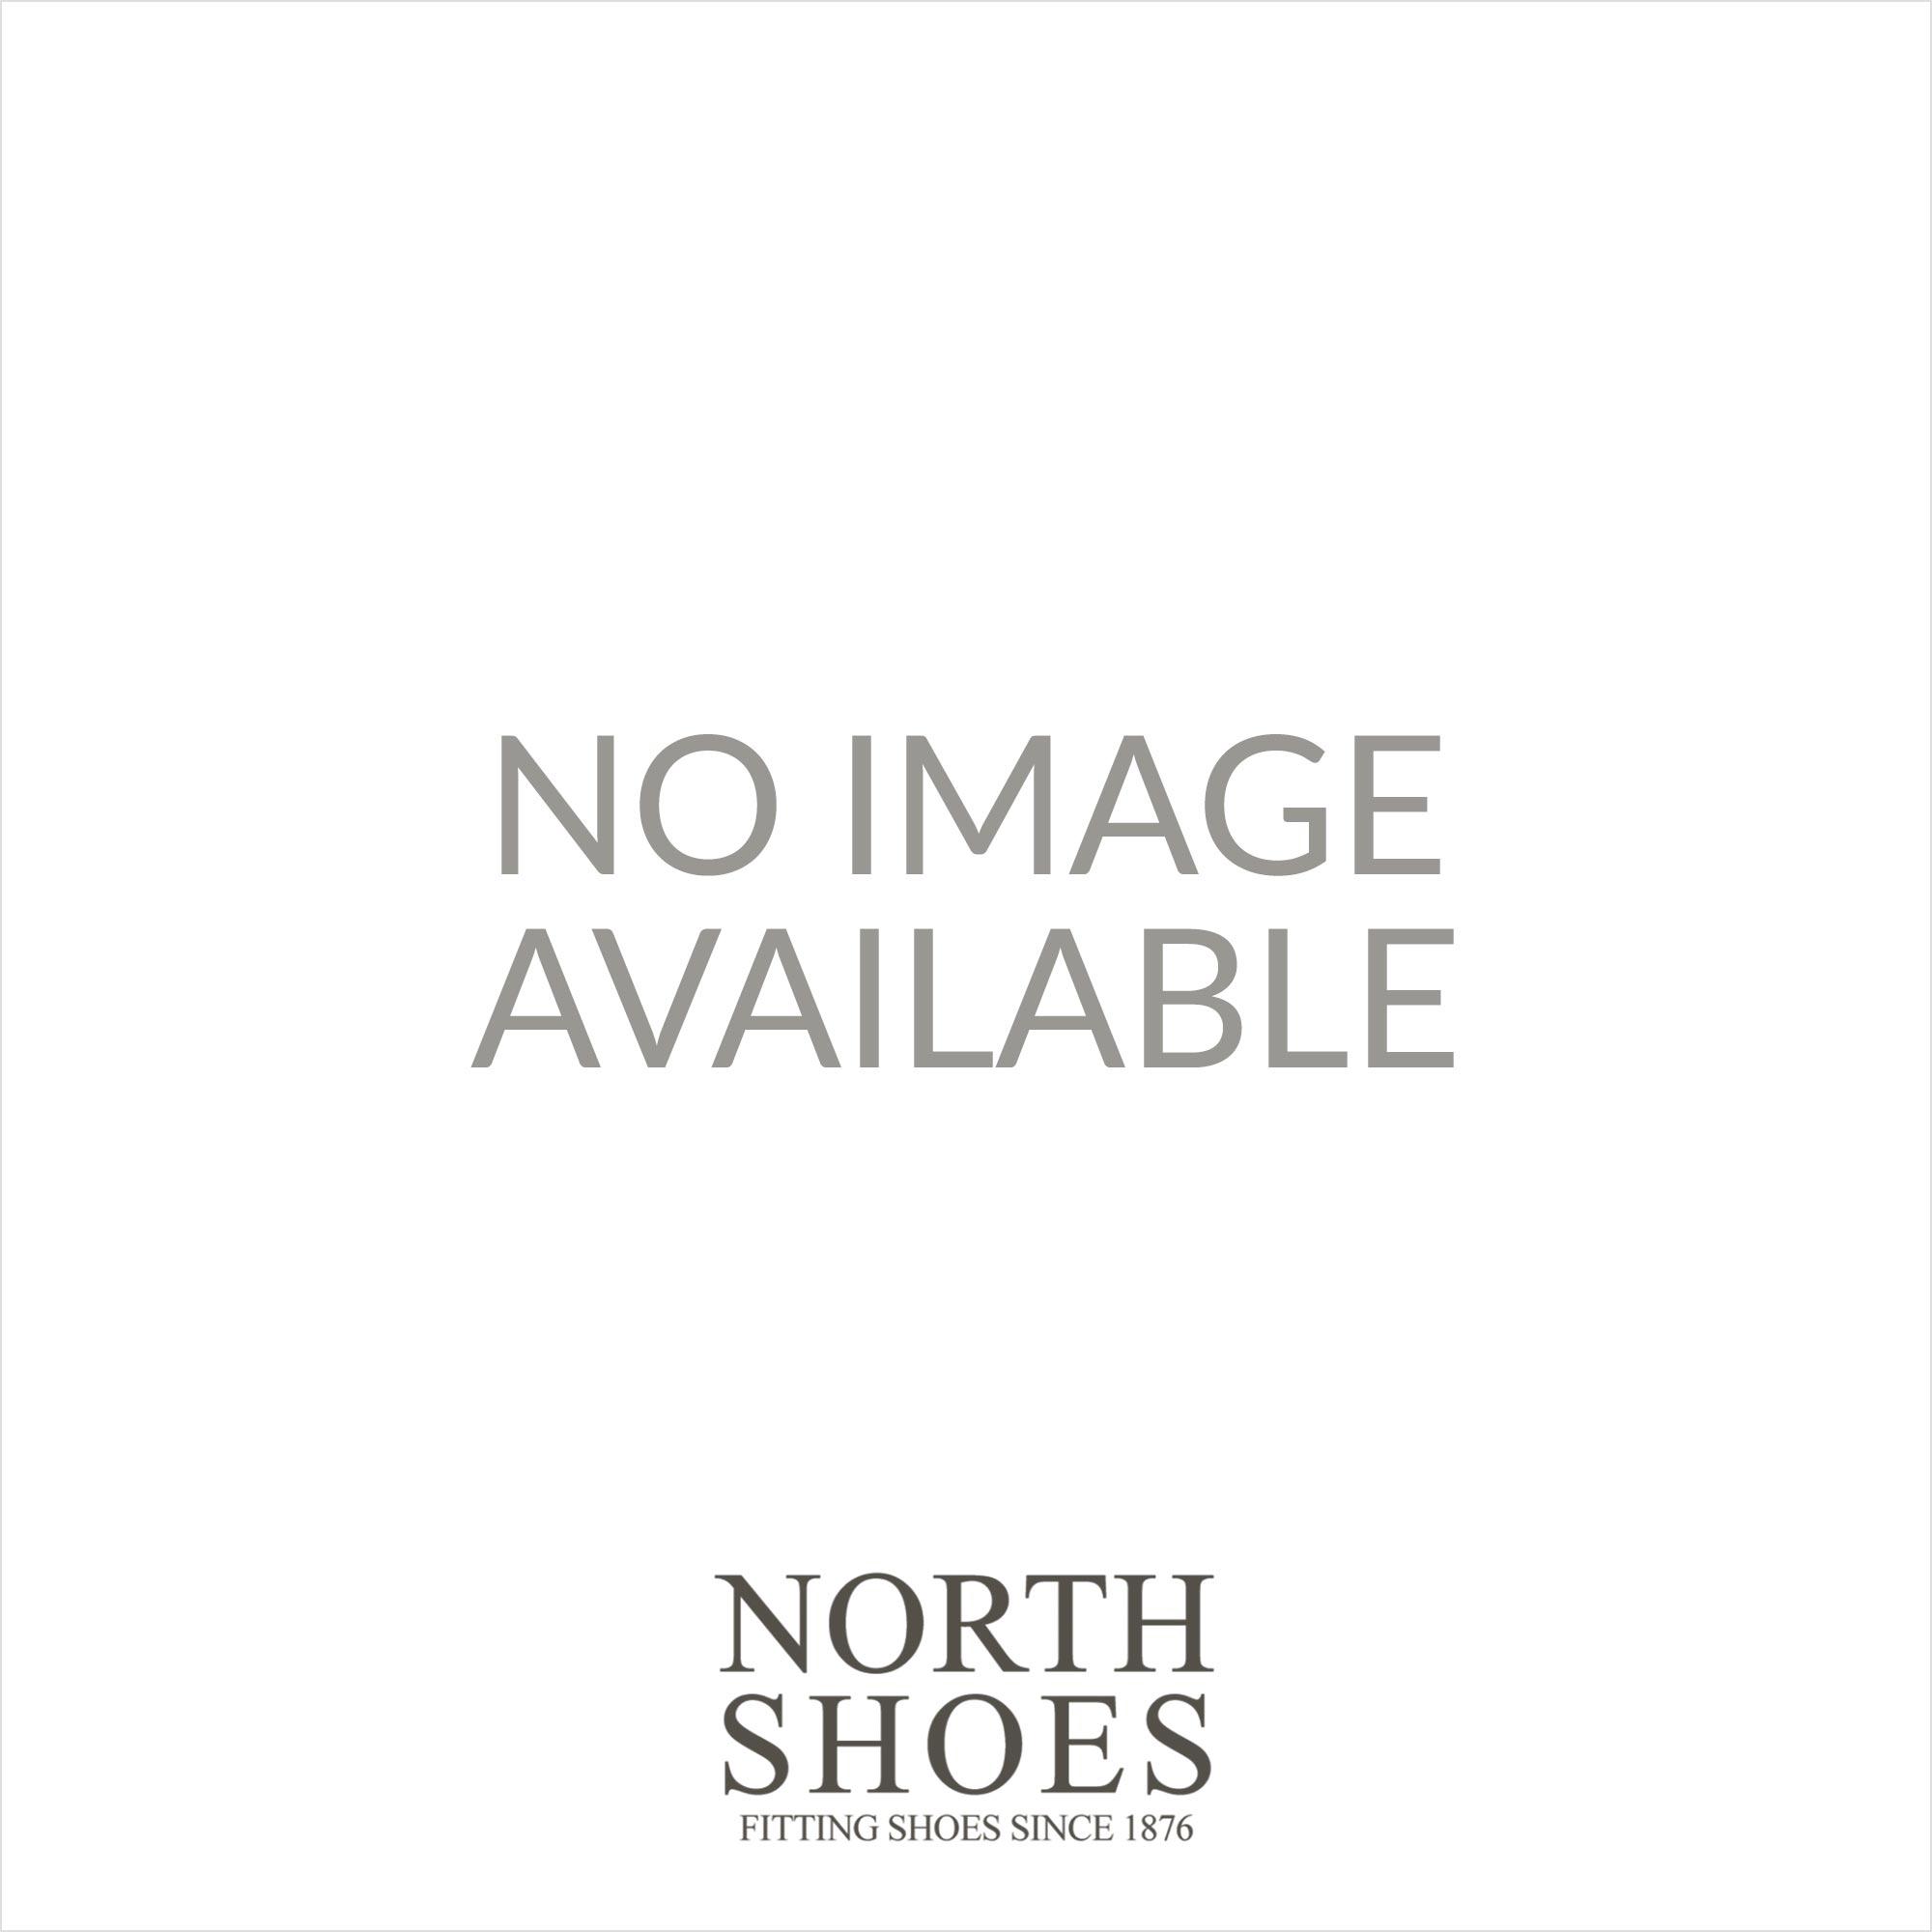 90 Leather Heeled Coloured Womens 43711 Rieker Multi Summer Shoe dECoBWrxeQ